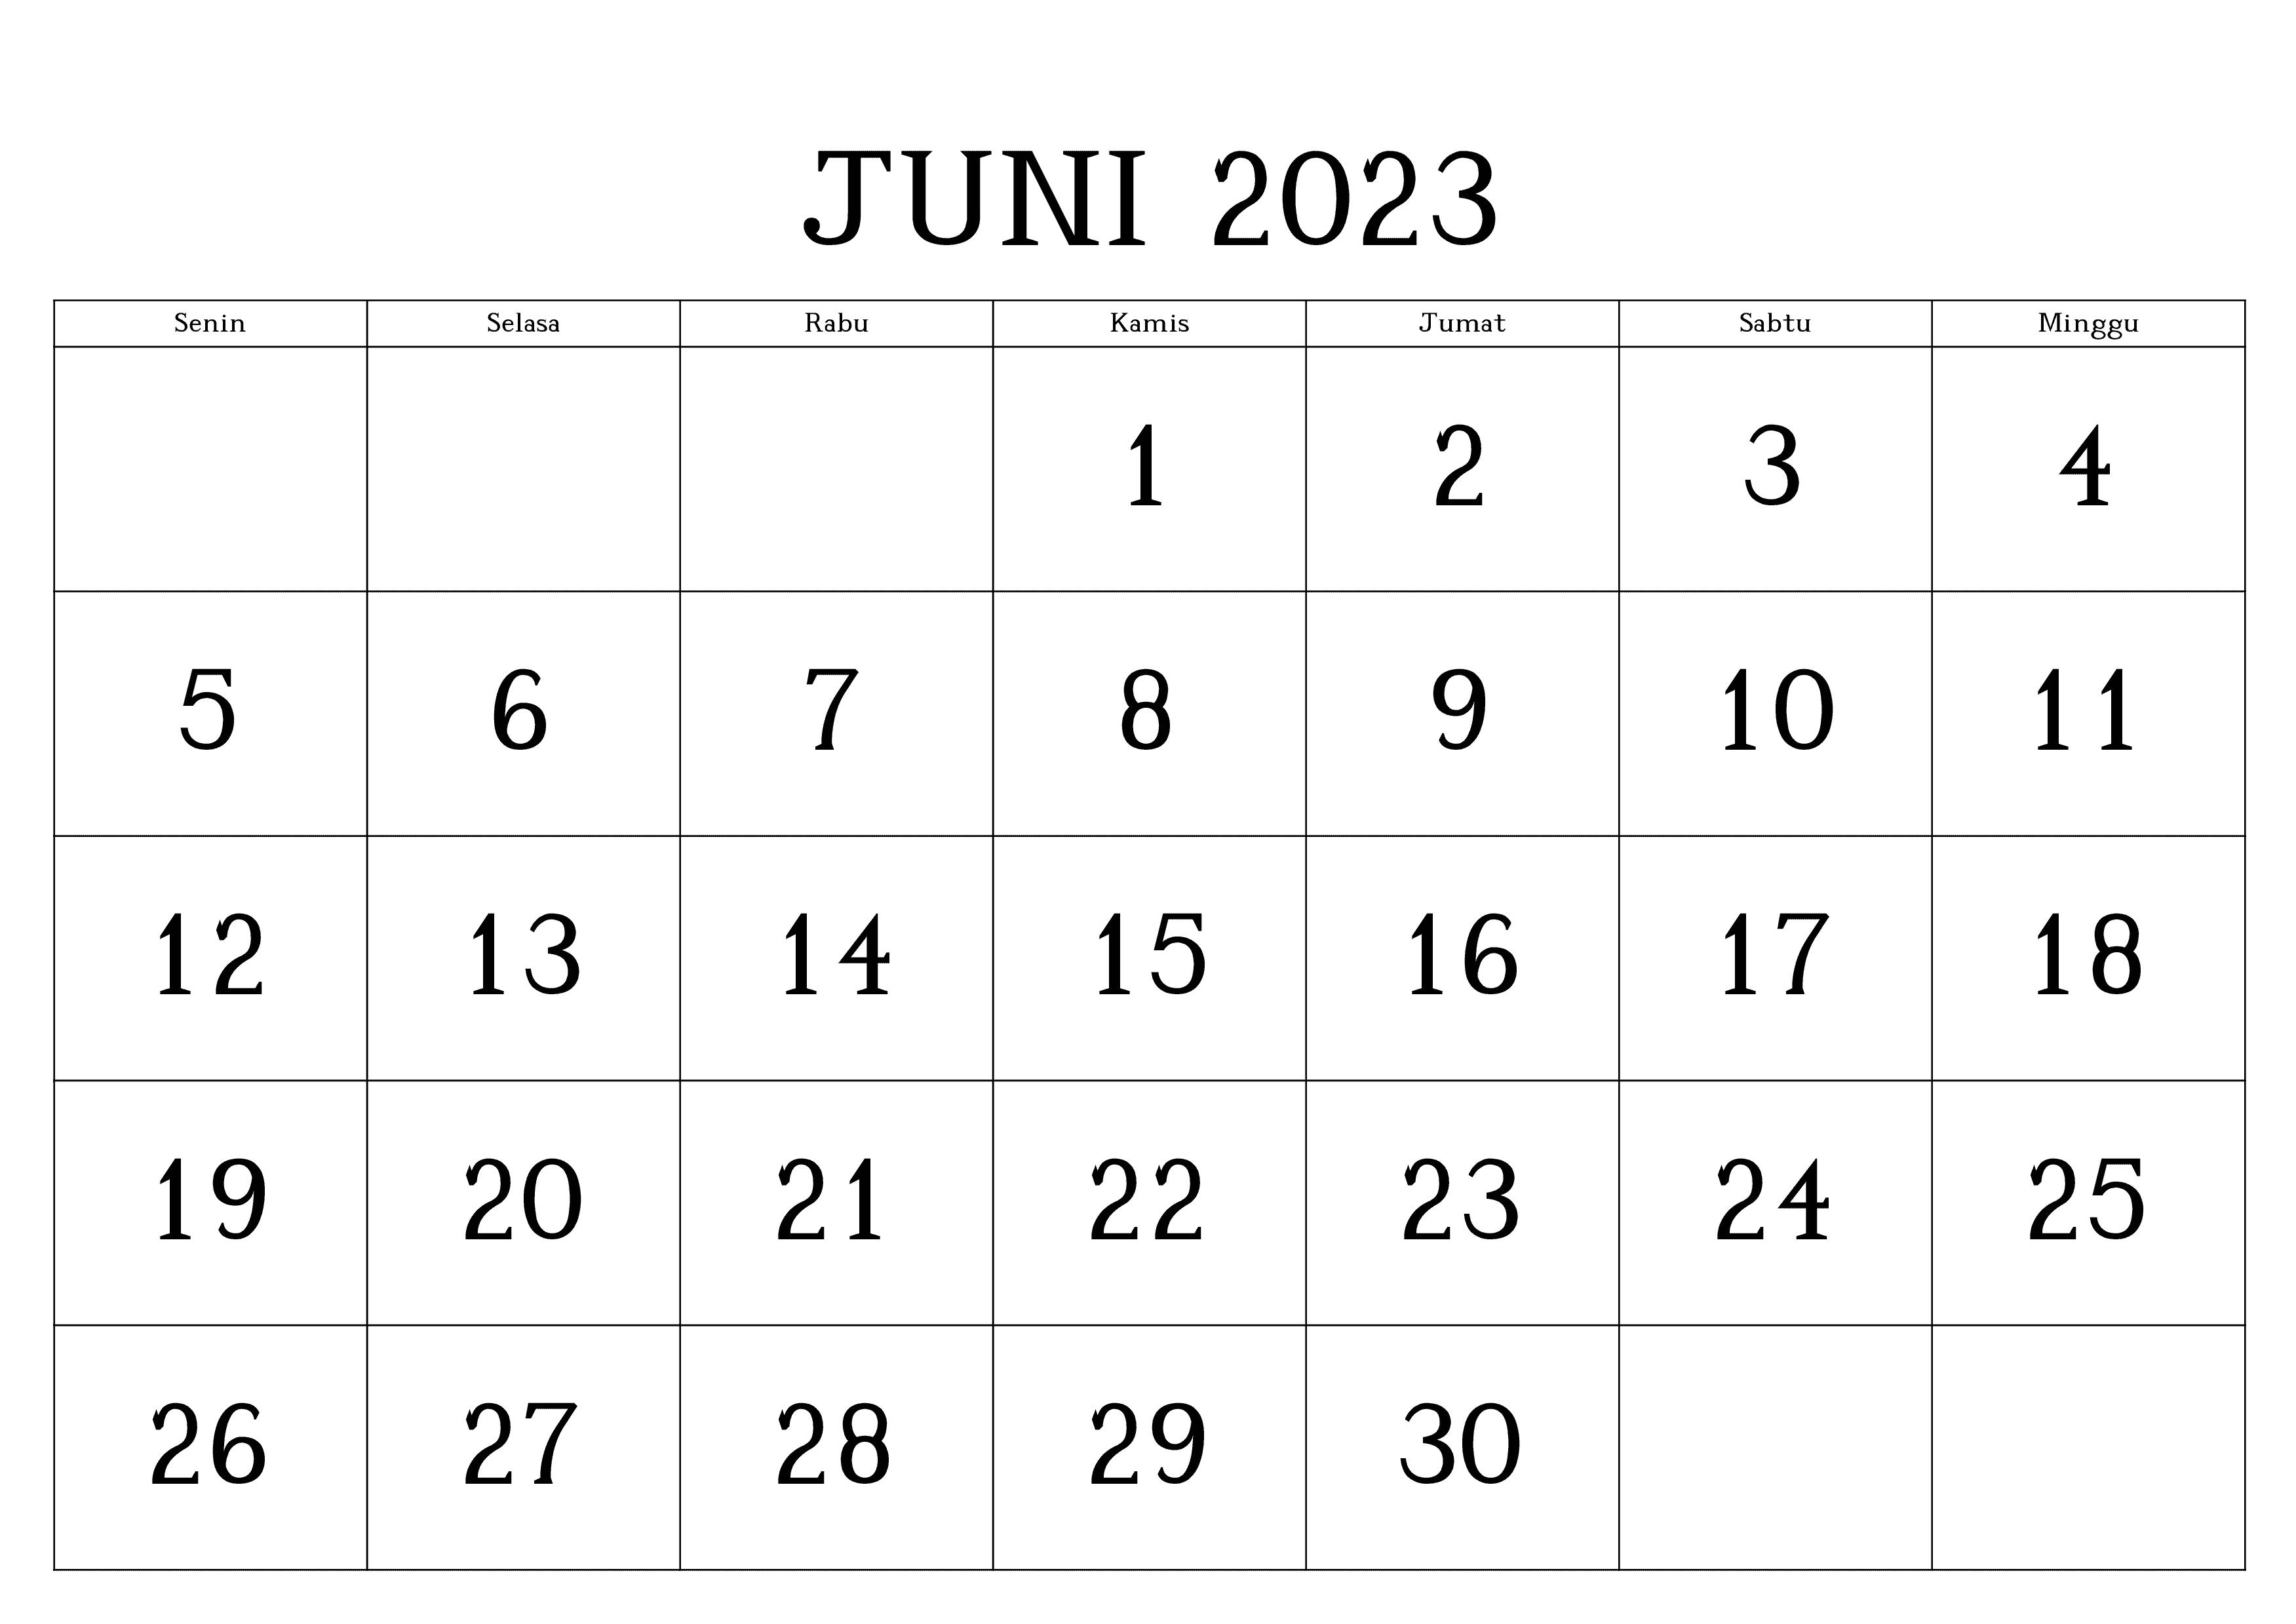 Juni 2023 Kalender